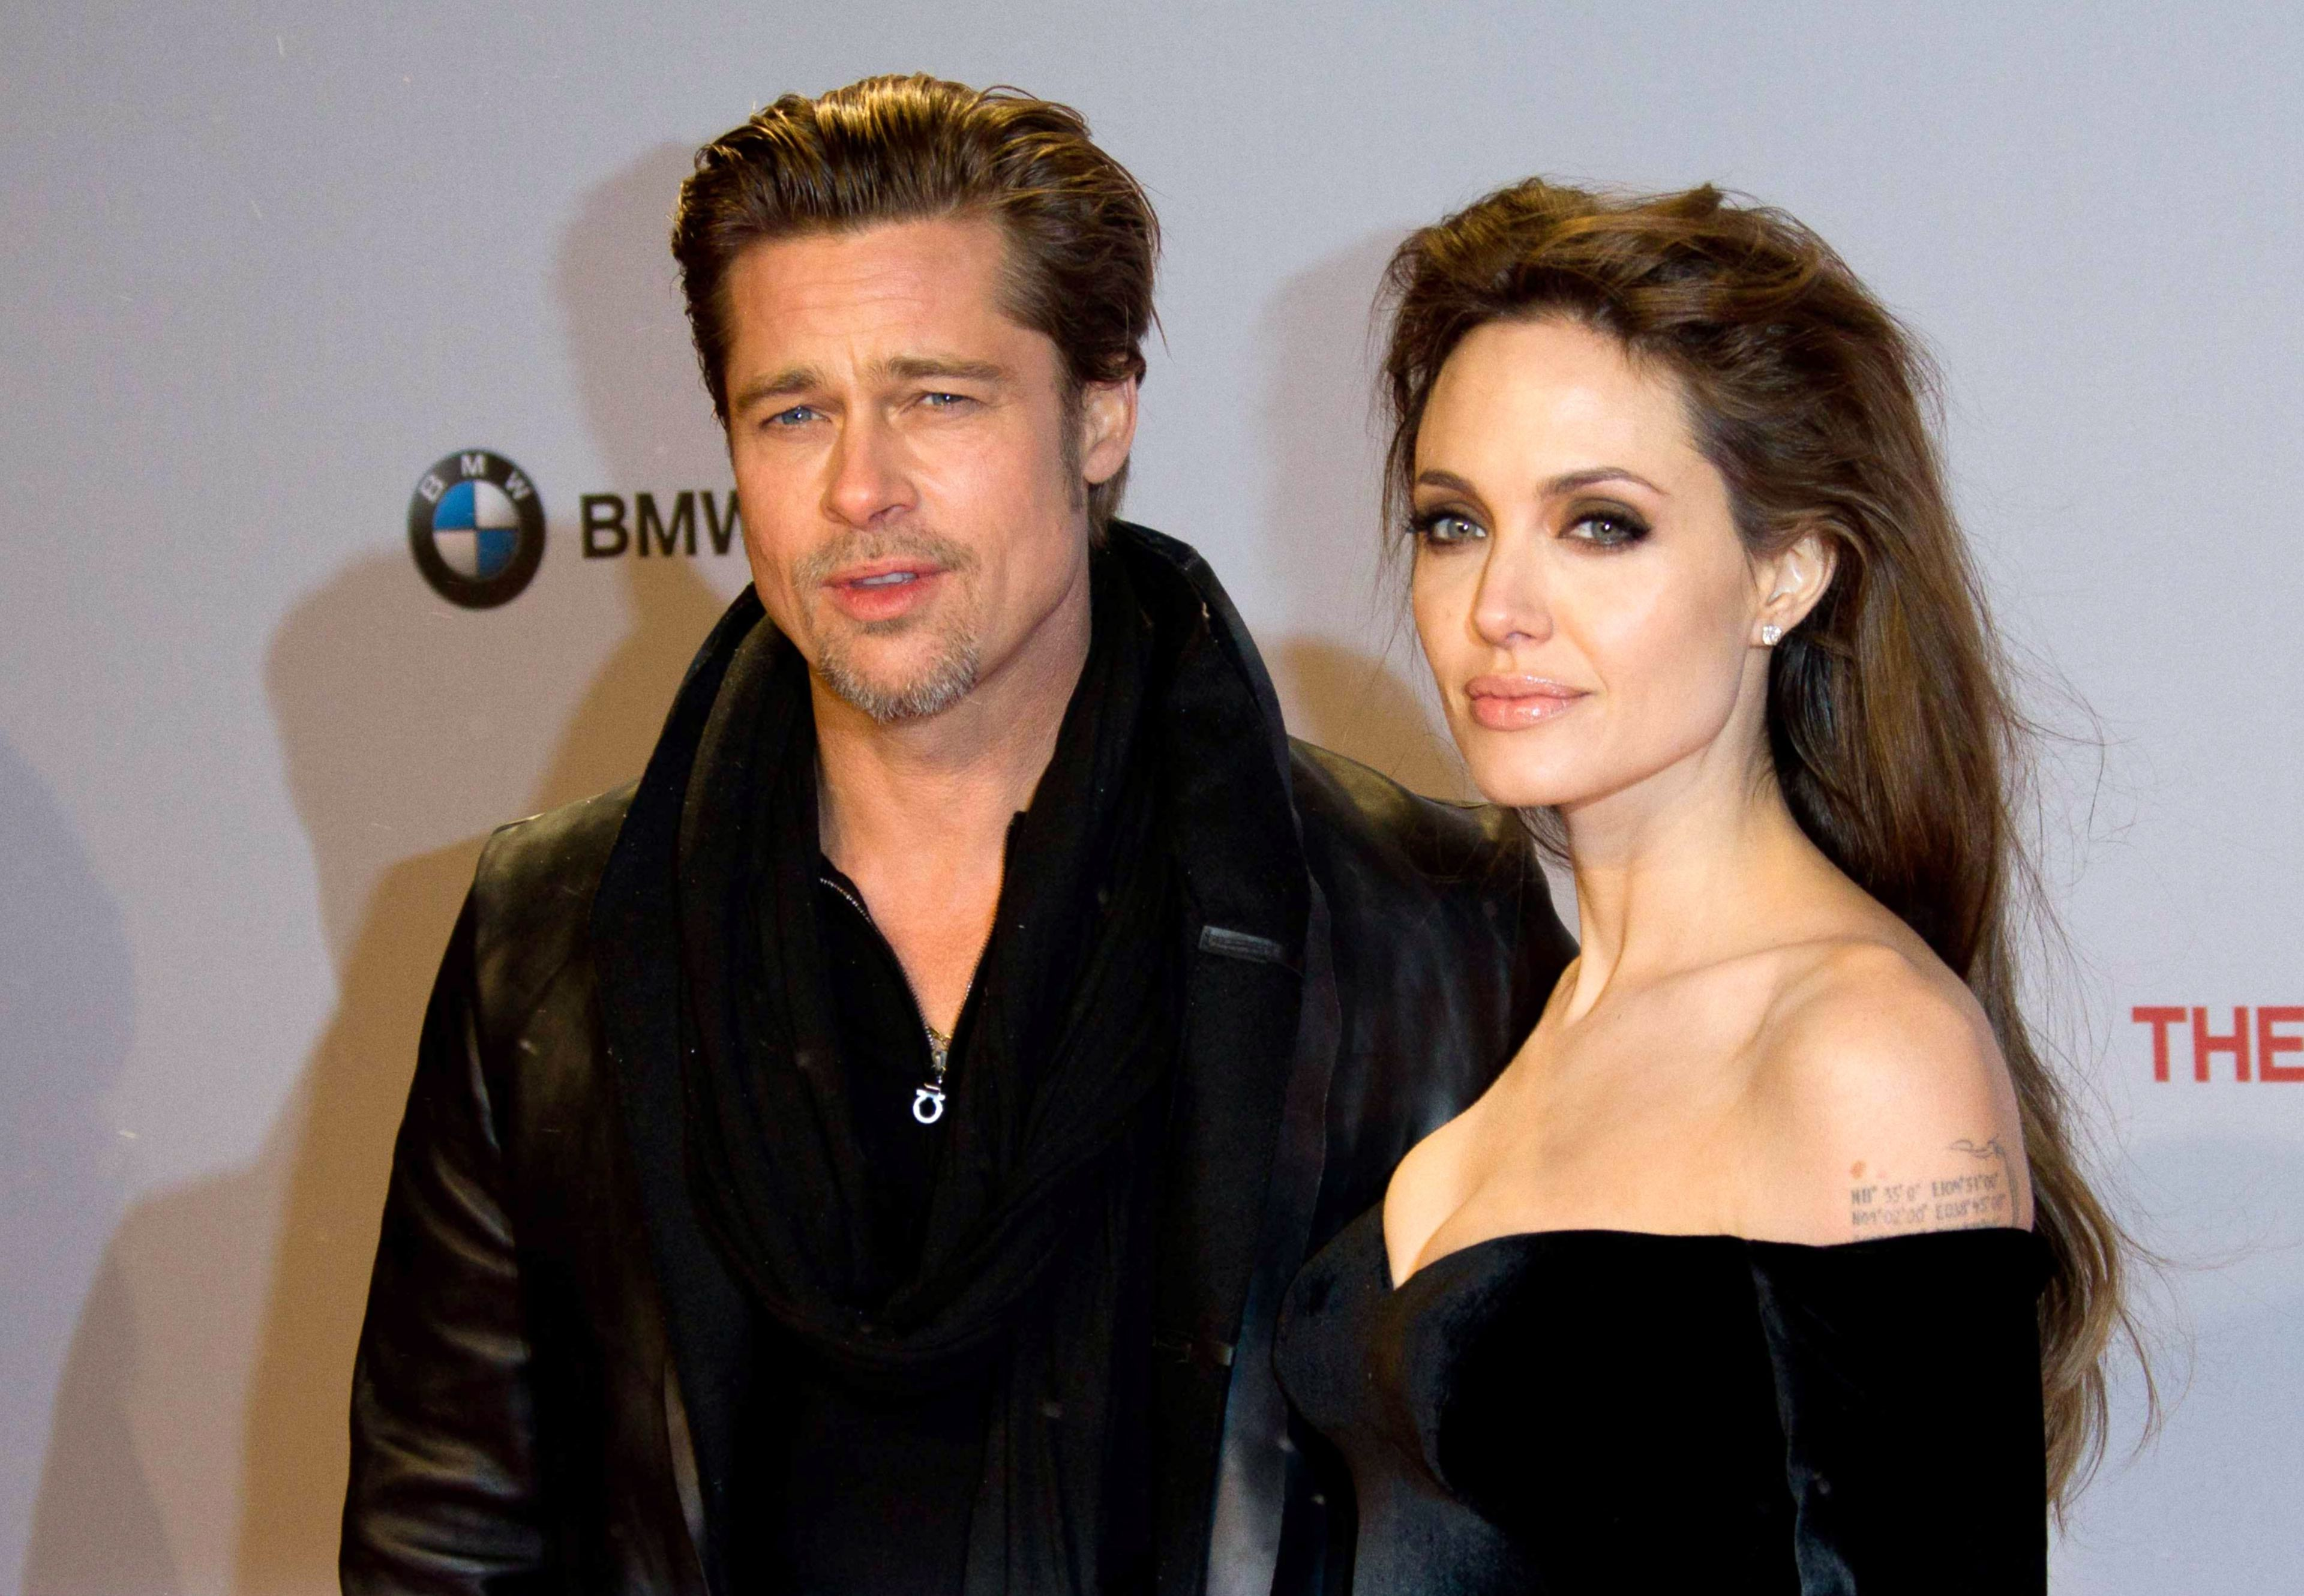 Sole Custody or Joint Custody – Angelina Jolie And Brad Pitt's Divorce Gets Messier